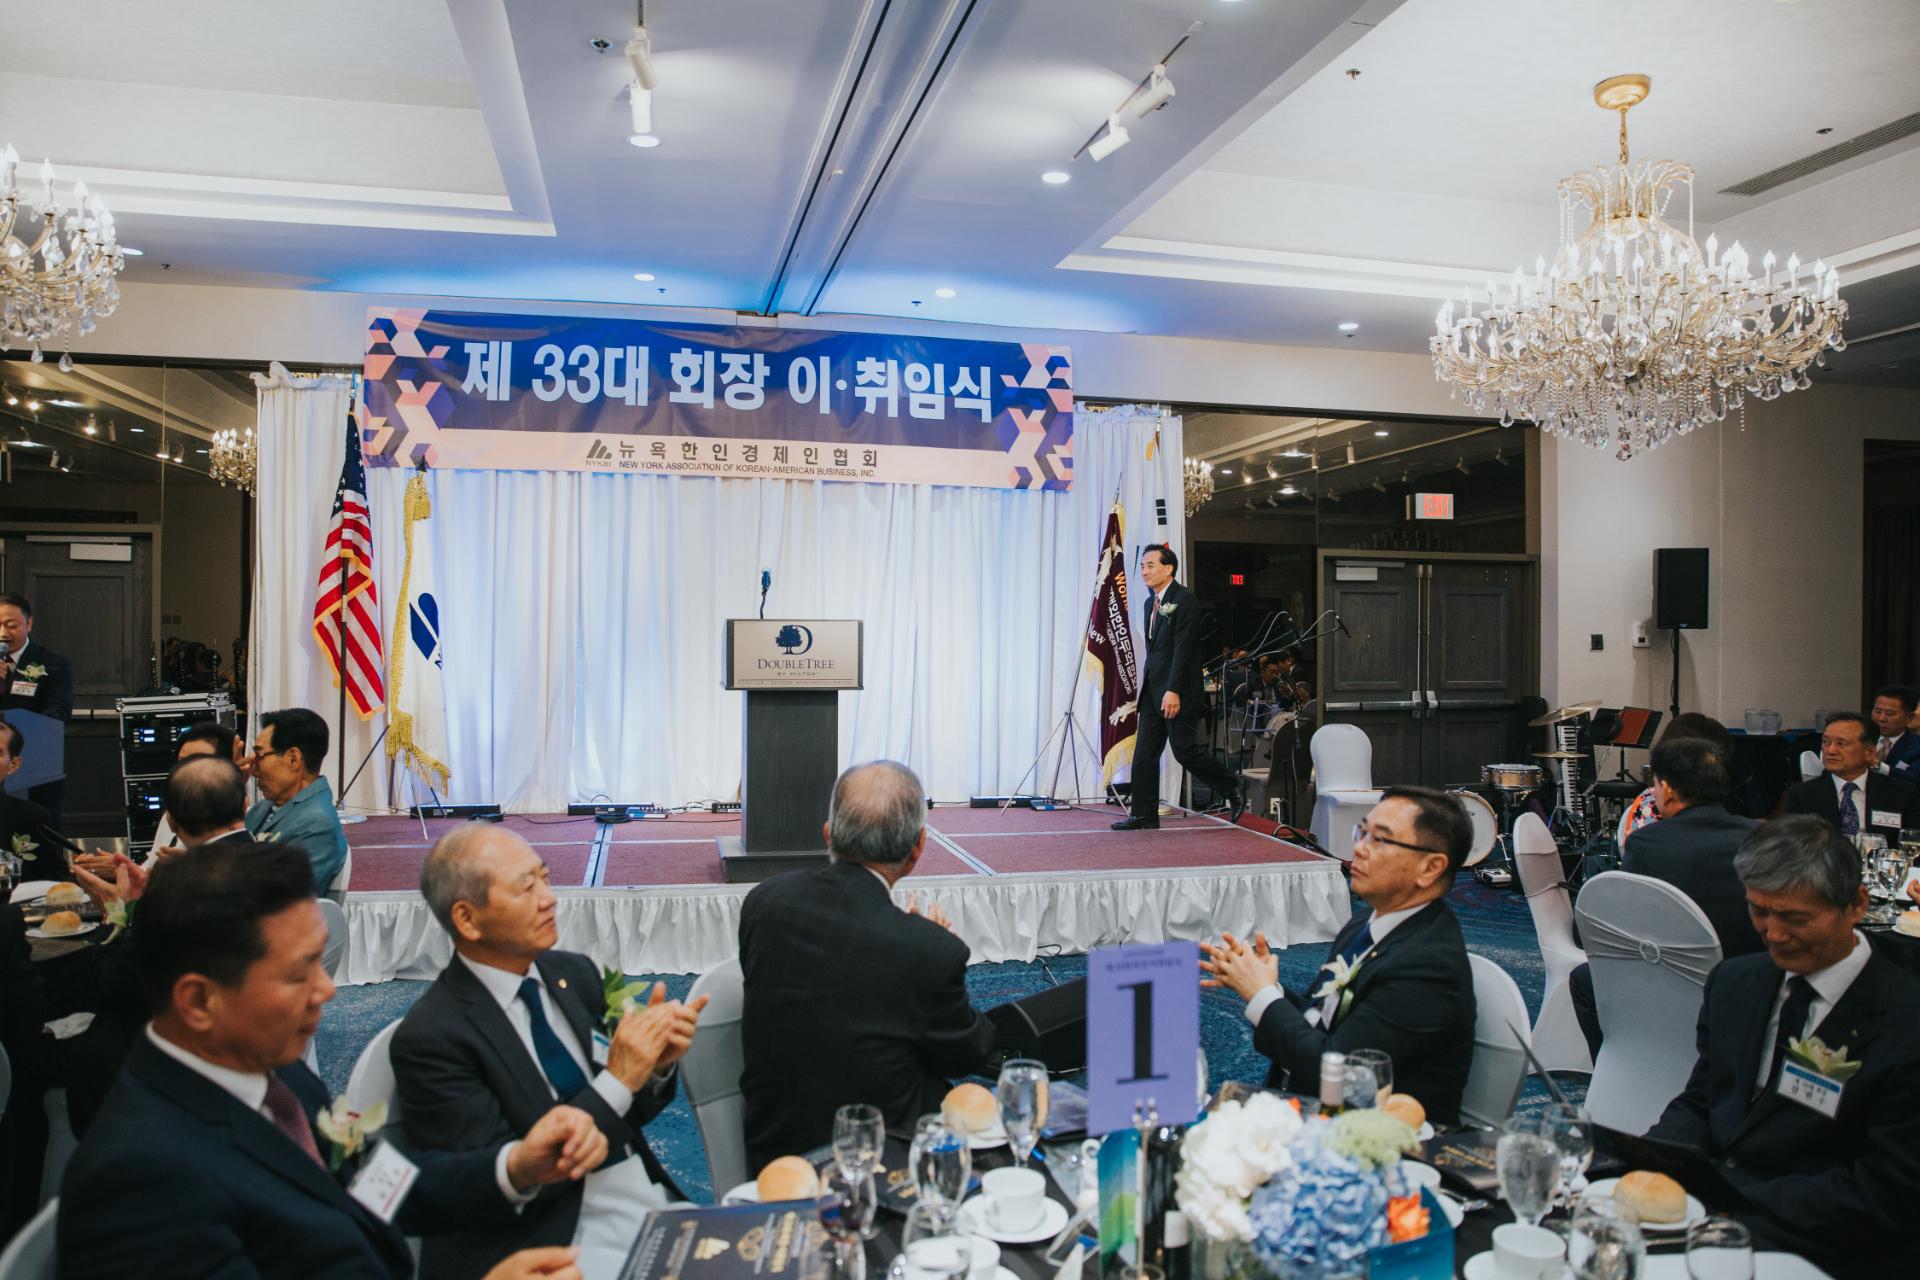 https://nykbi.com/new/wp-content/uploads/2019/07/190607-NYKBI-Inauguration-Ceremony-113.jpg